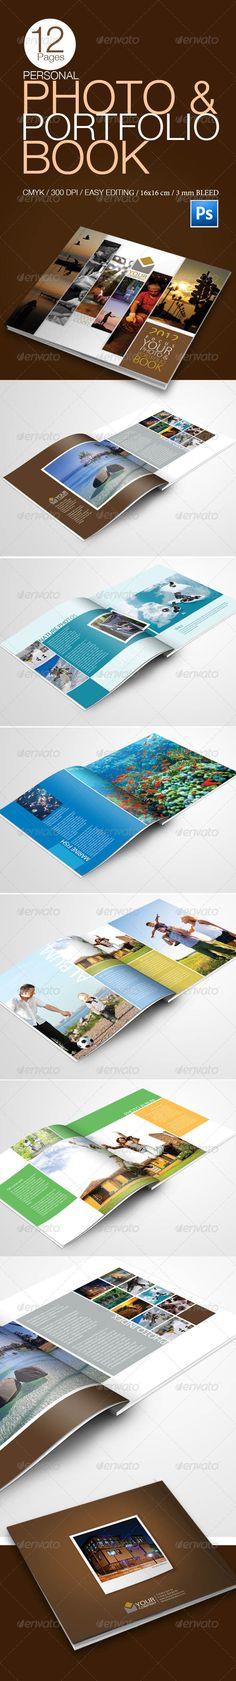 Your Photo & Portfolio Book